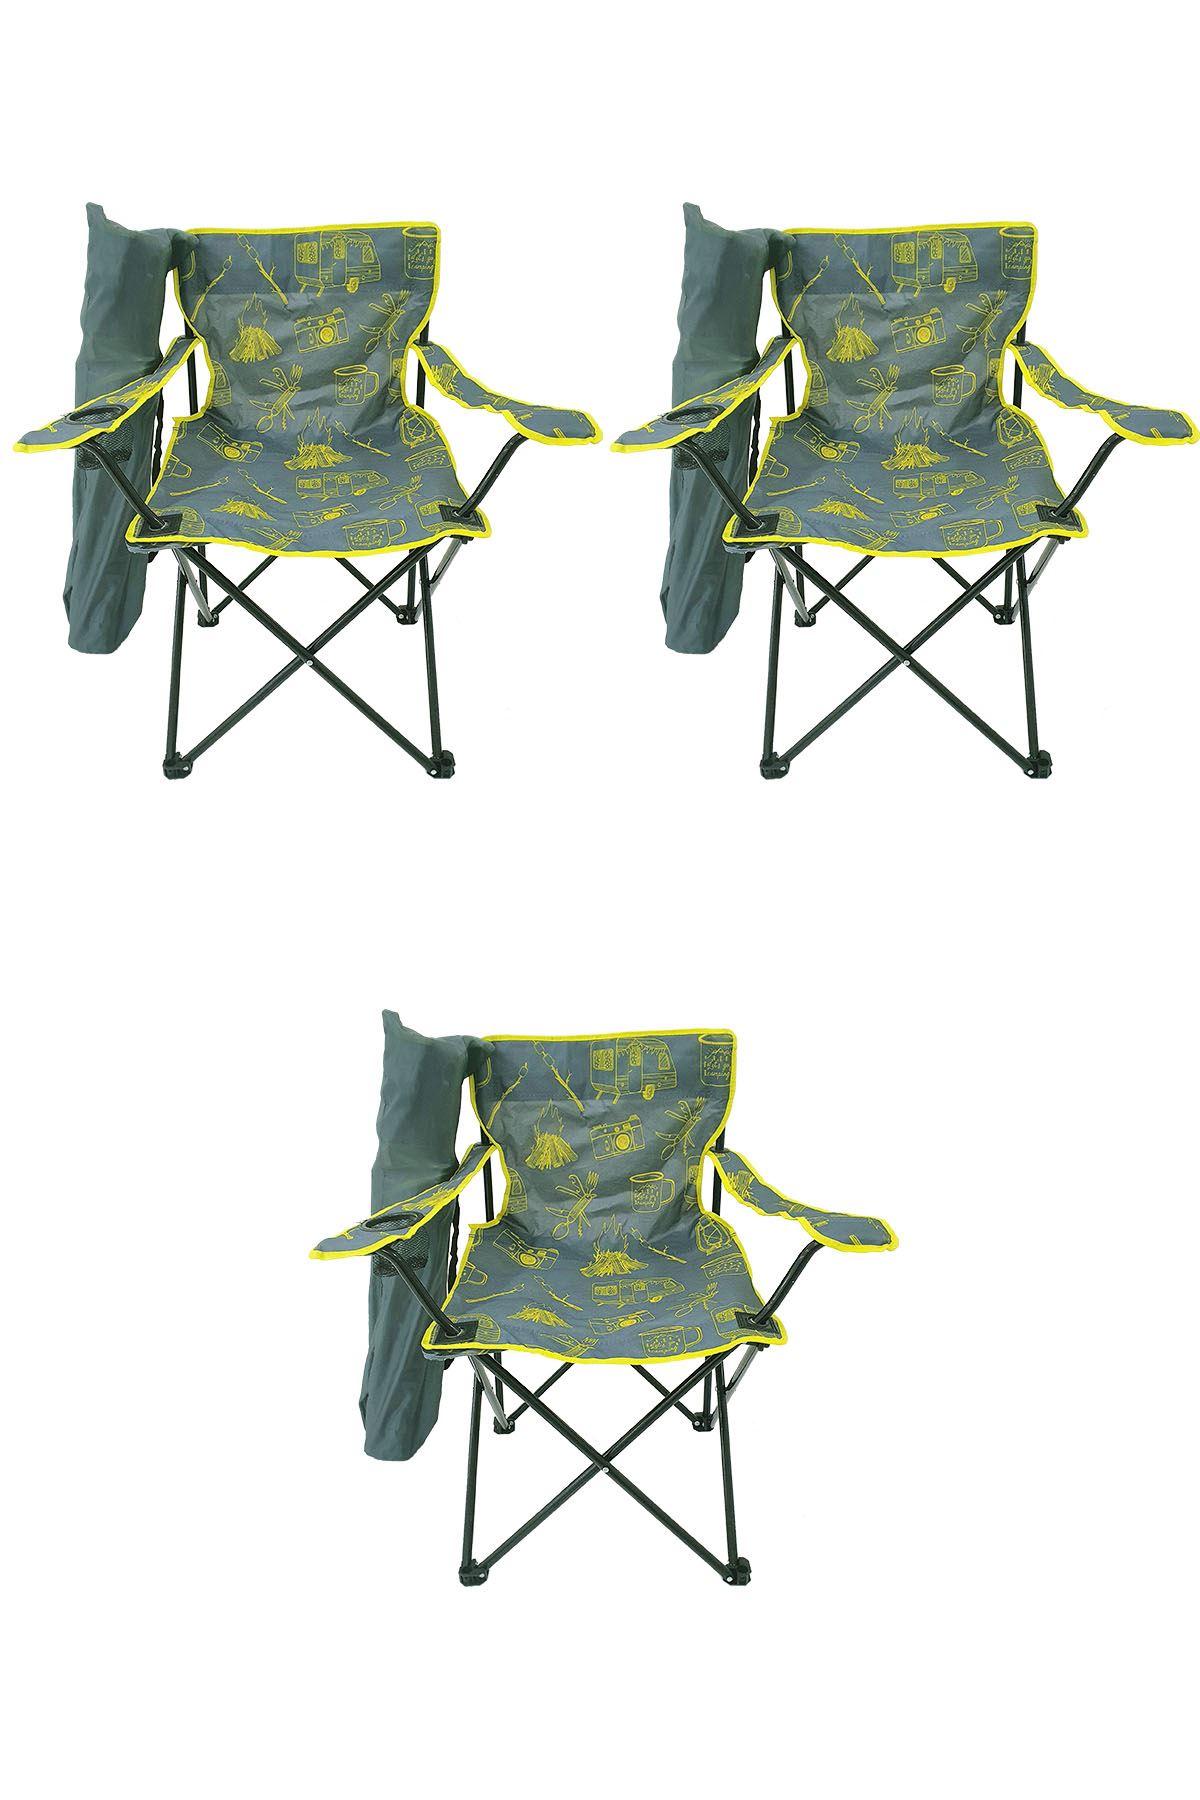 Bofigo 3 Pcs Camping Chair Folding Chair Garden Chair Picnic Beach Chair Patterned Gray